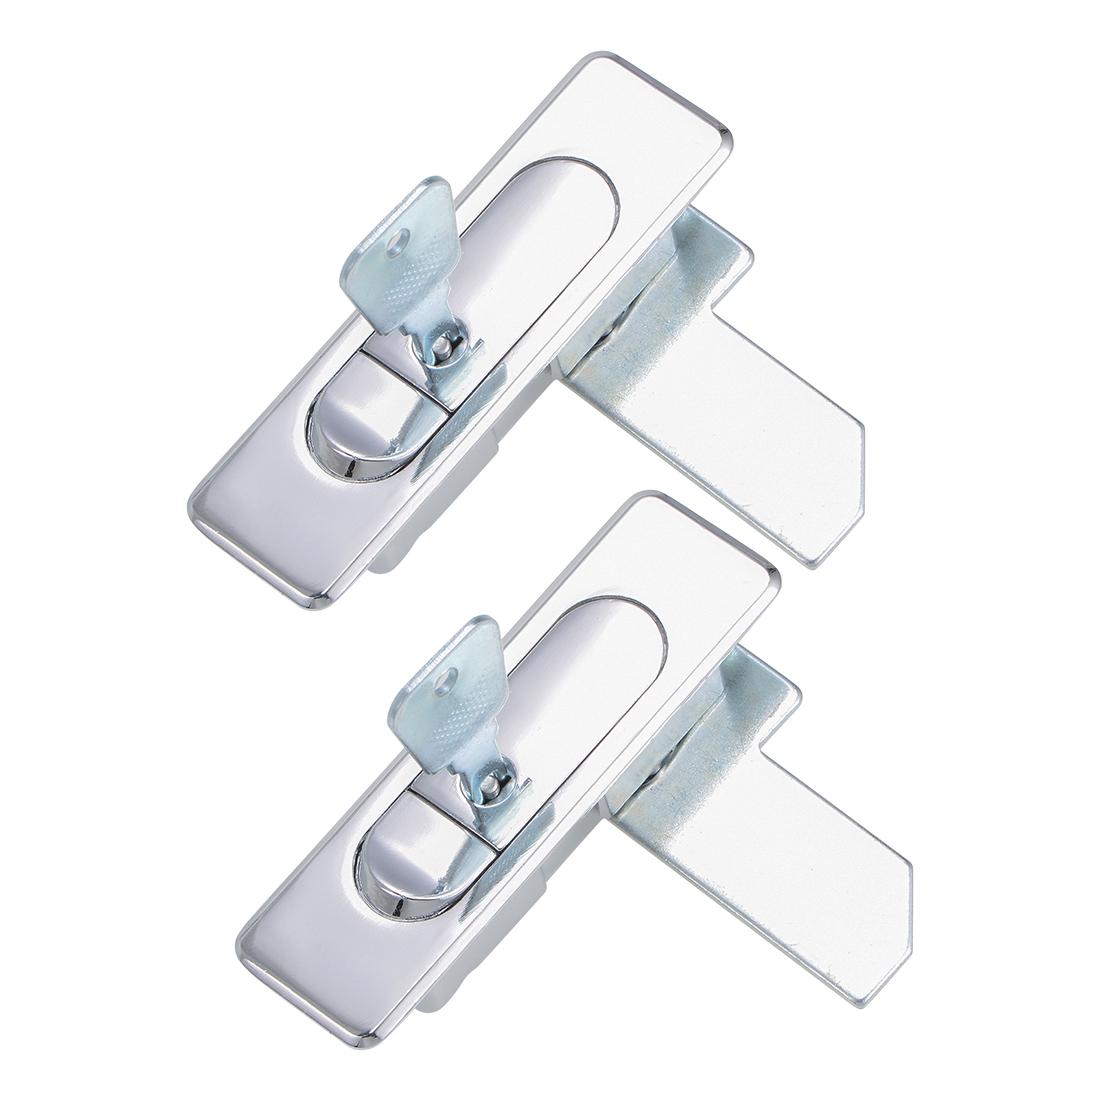 Electric Cabinet Panel Cam Lock Push Button Pop Up Door Lock w Key Glossy 2pcs